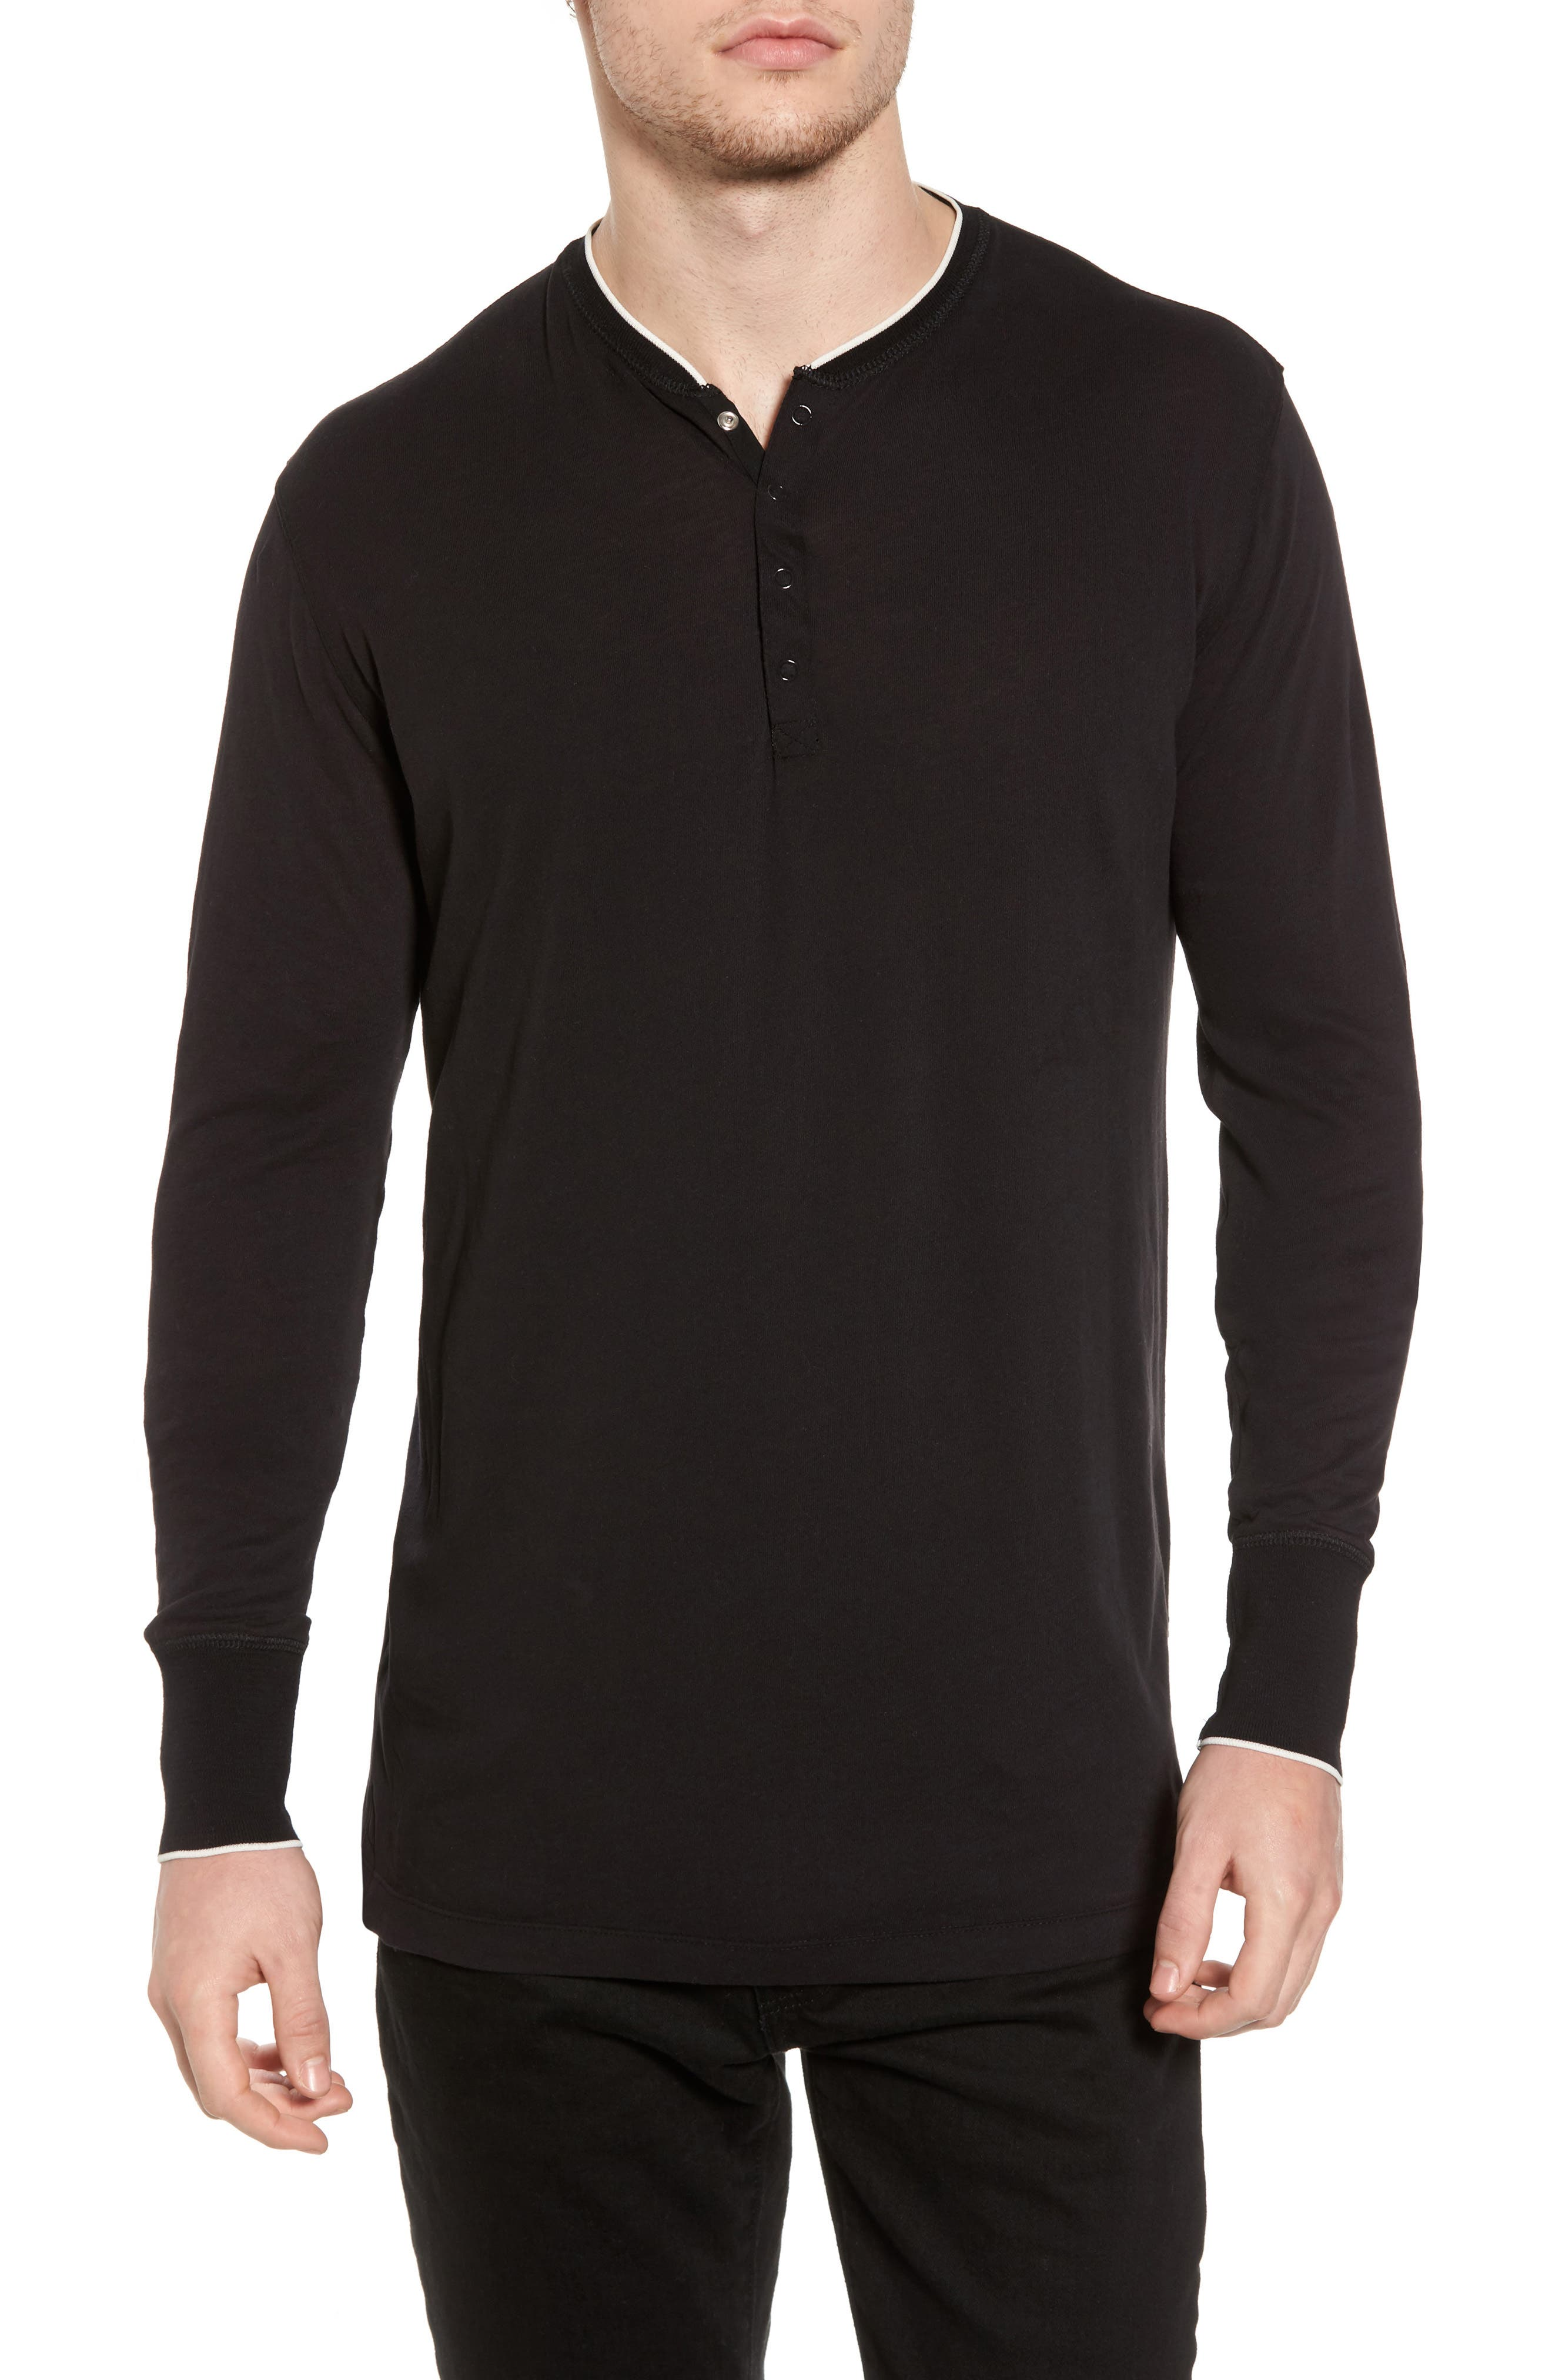 Alternate Image 1 Selected - Scotch & Soda Club Nomade Soft Granddad T-Shirt